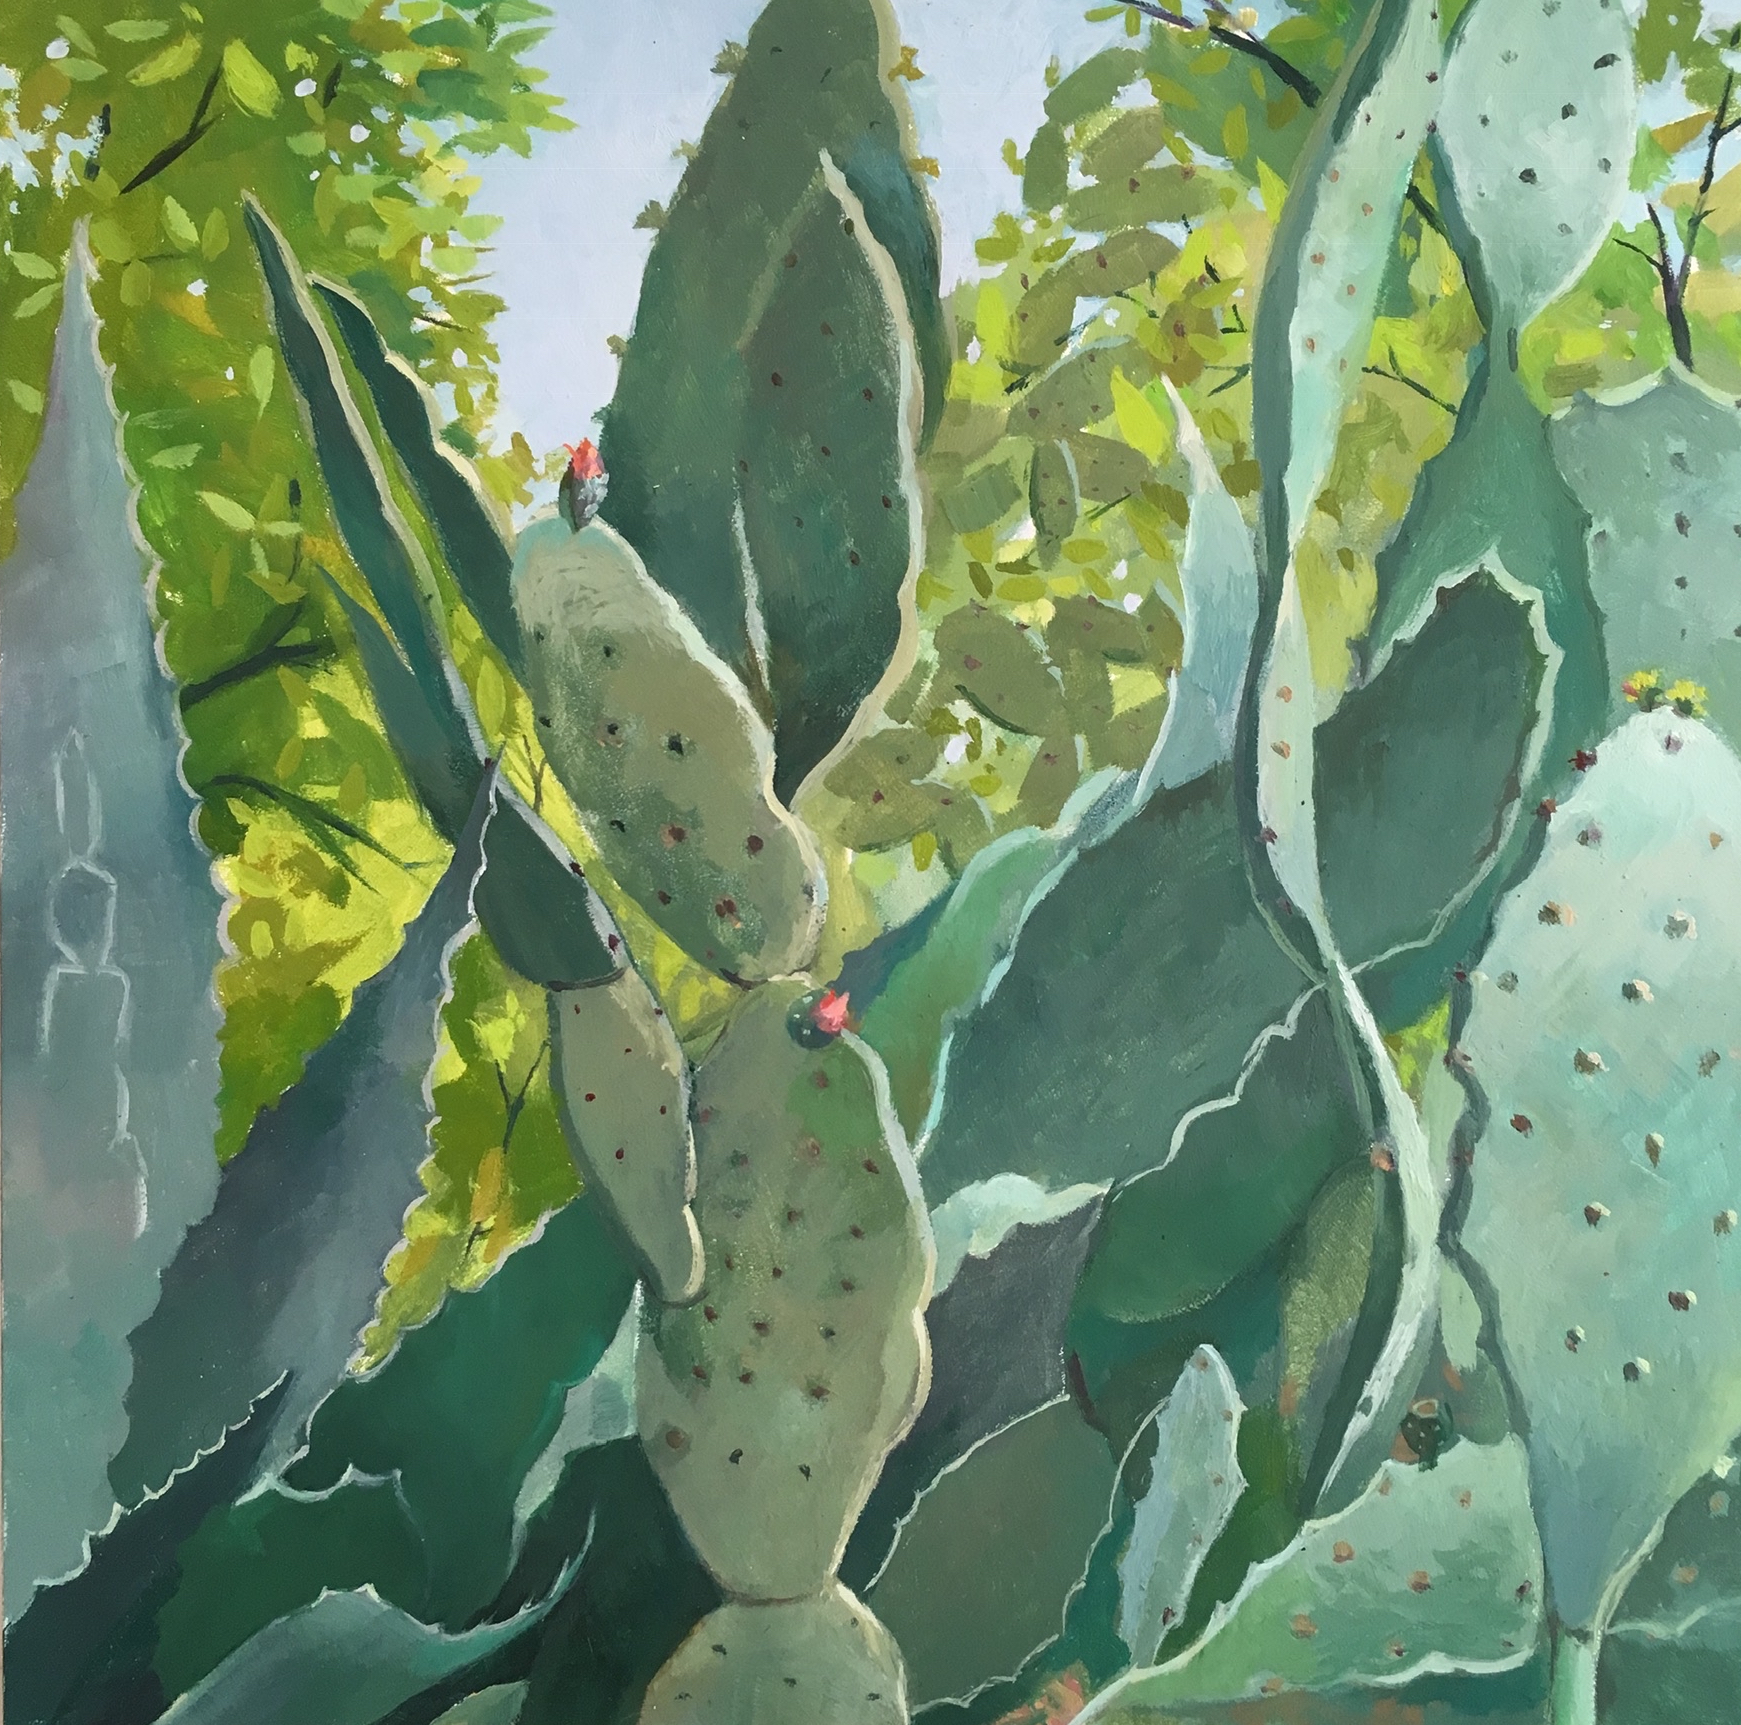 L.A. Garden #2